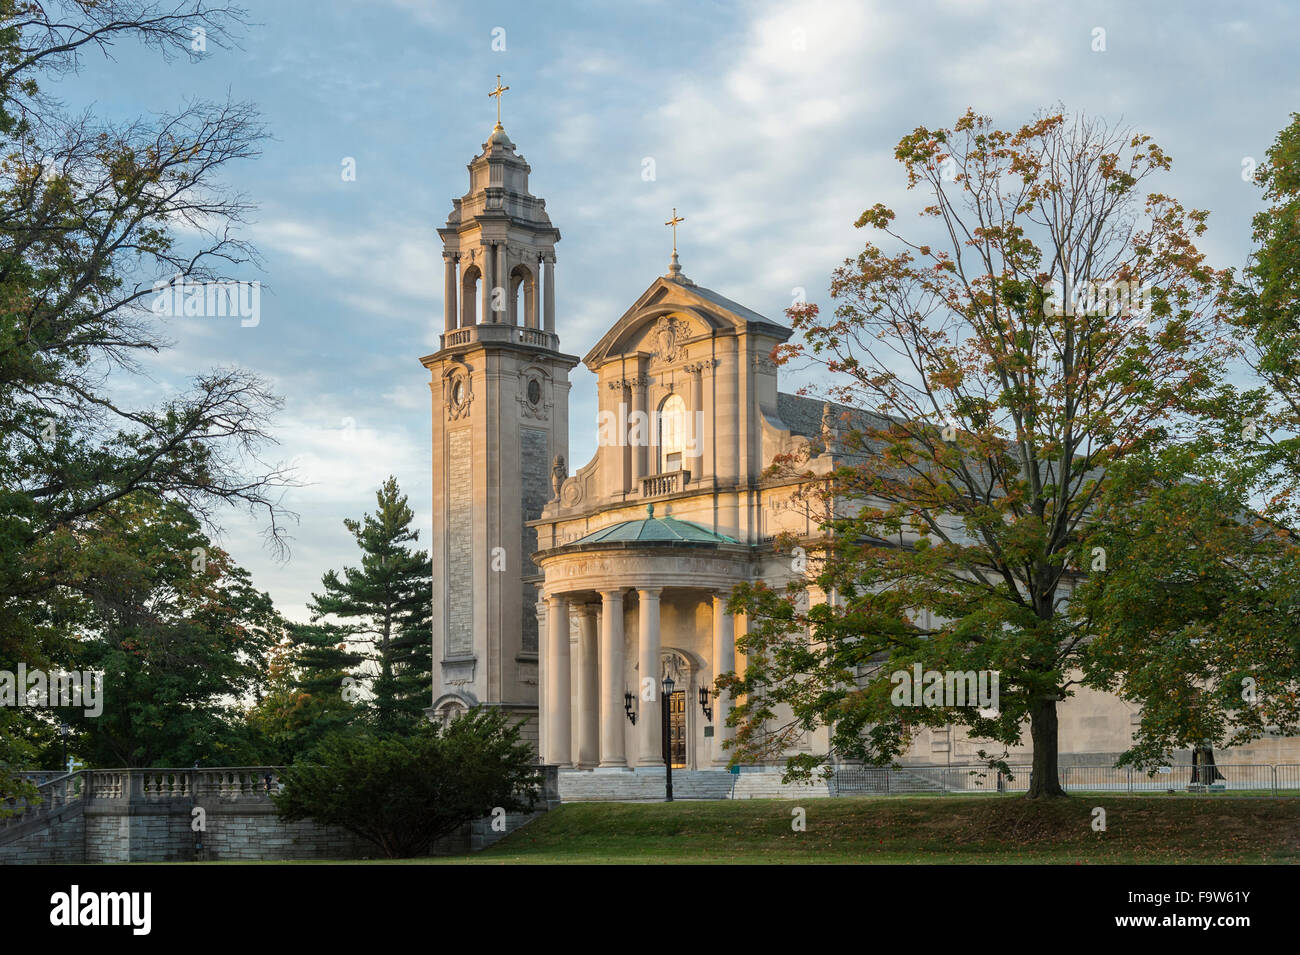 Saint Martin's Chapel, Saint Charles Seminary, Philadelphia, Pennsylvania, USA - Stock Image